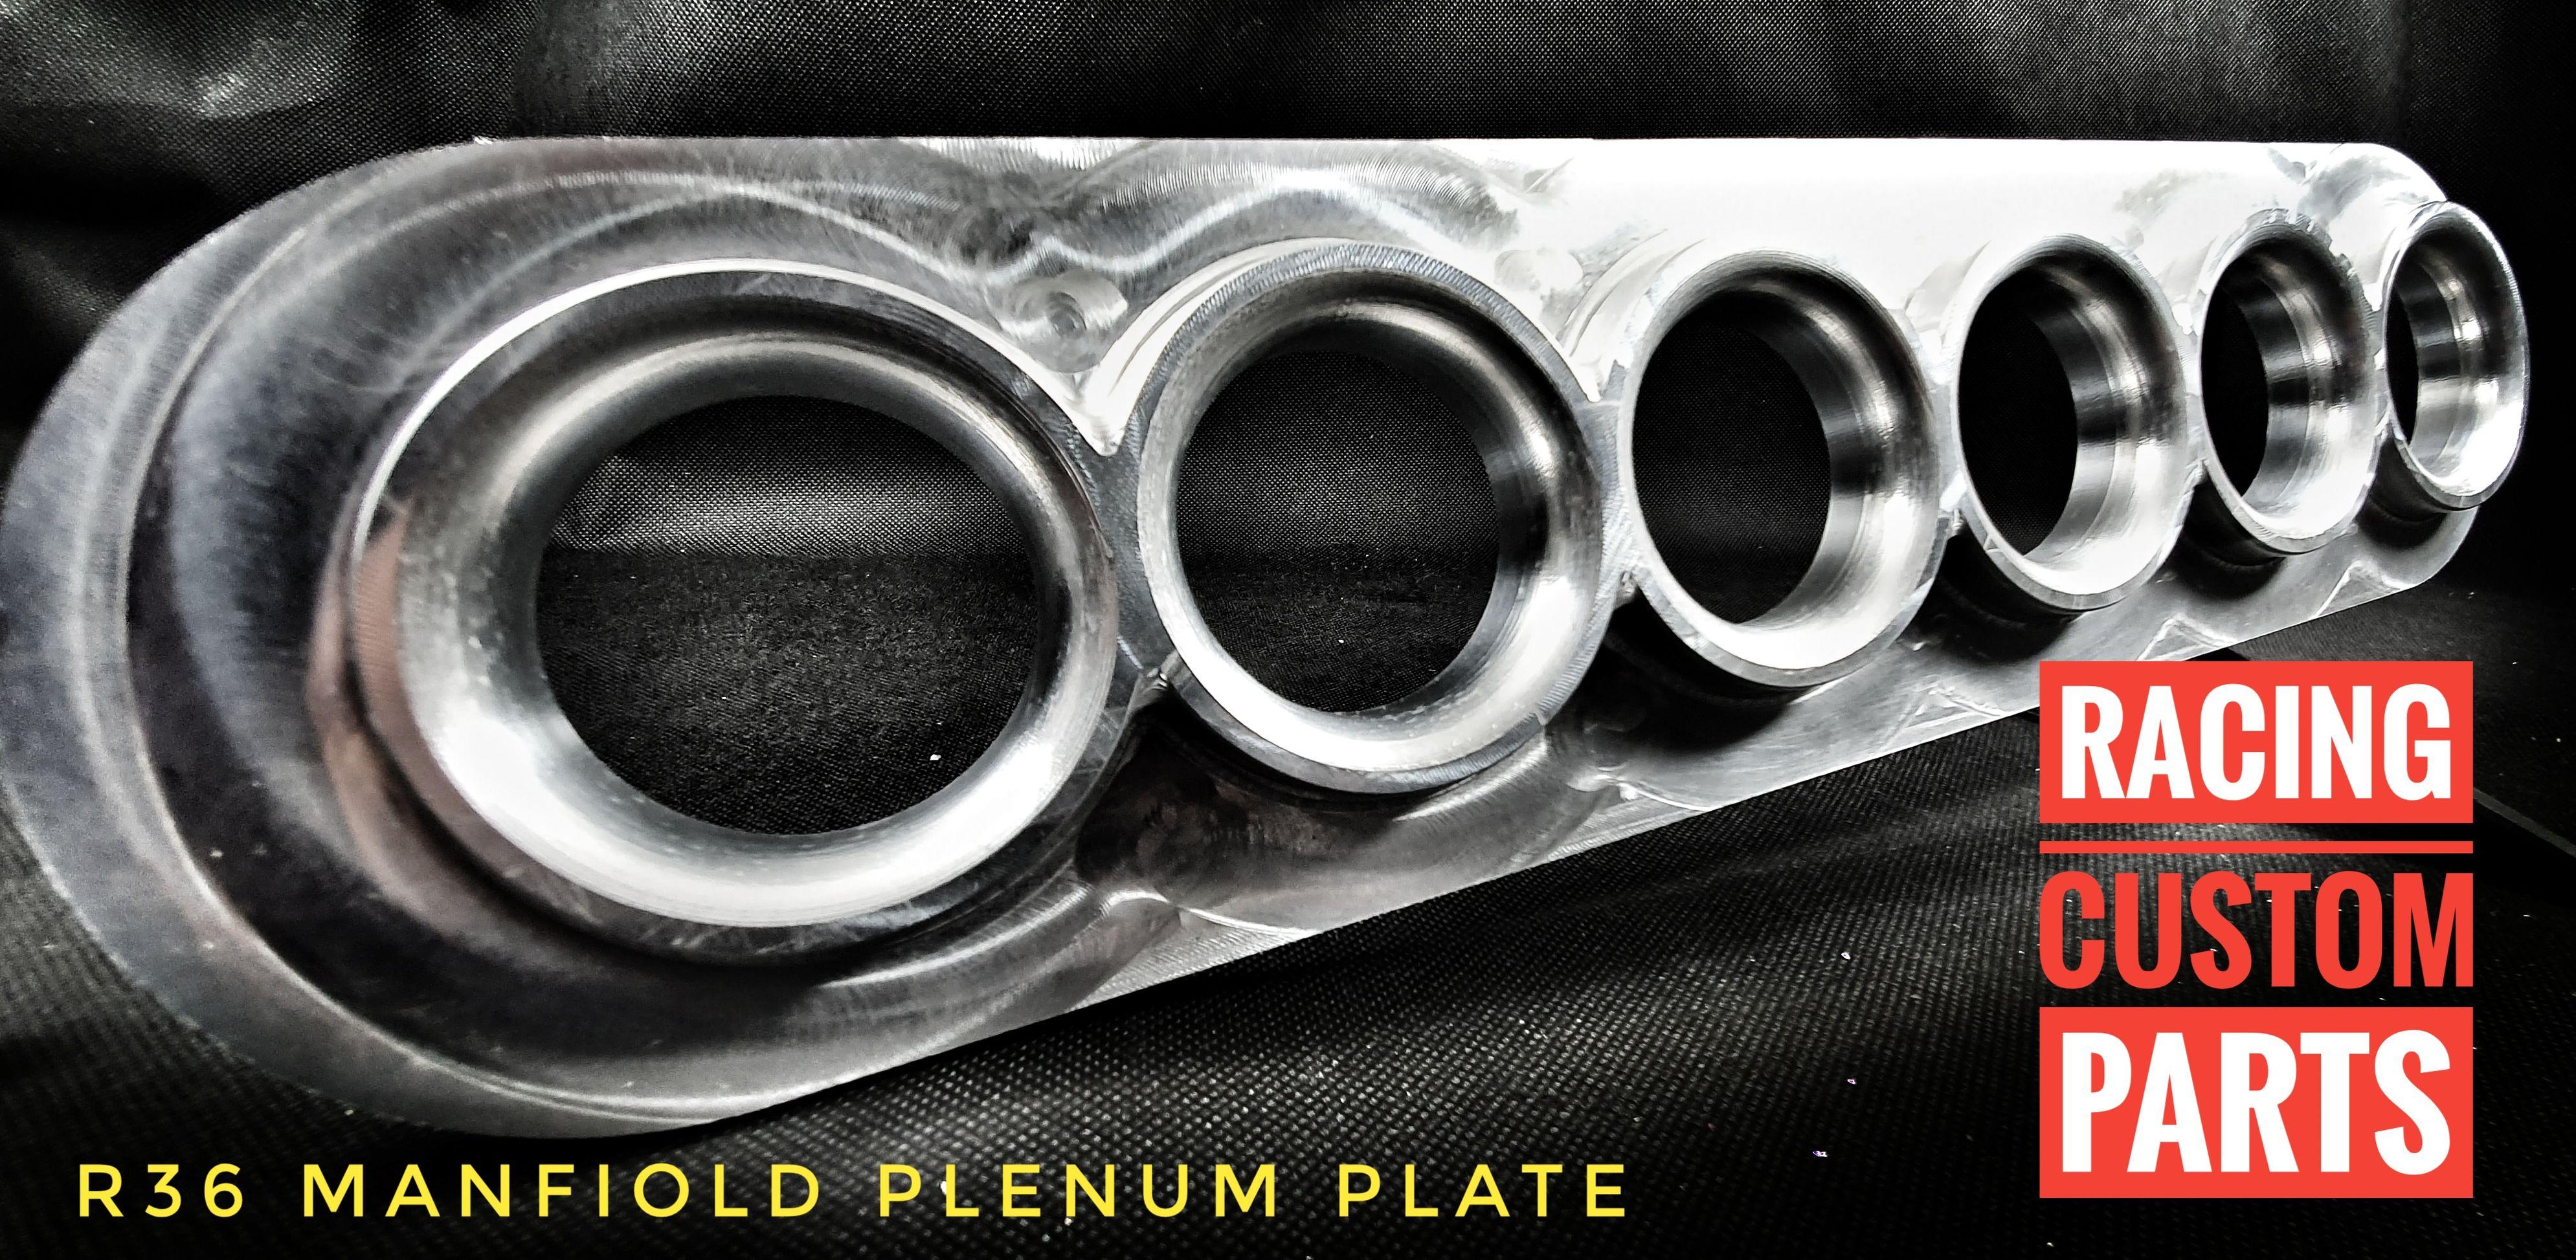 R36 audi vw passat 3.6 v6 custom billet cnc intake inlet manifold plate mpi adapter racing custom parts